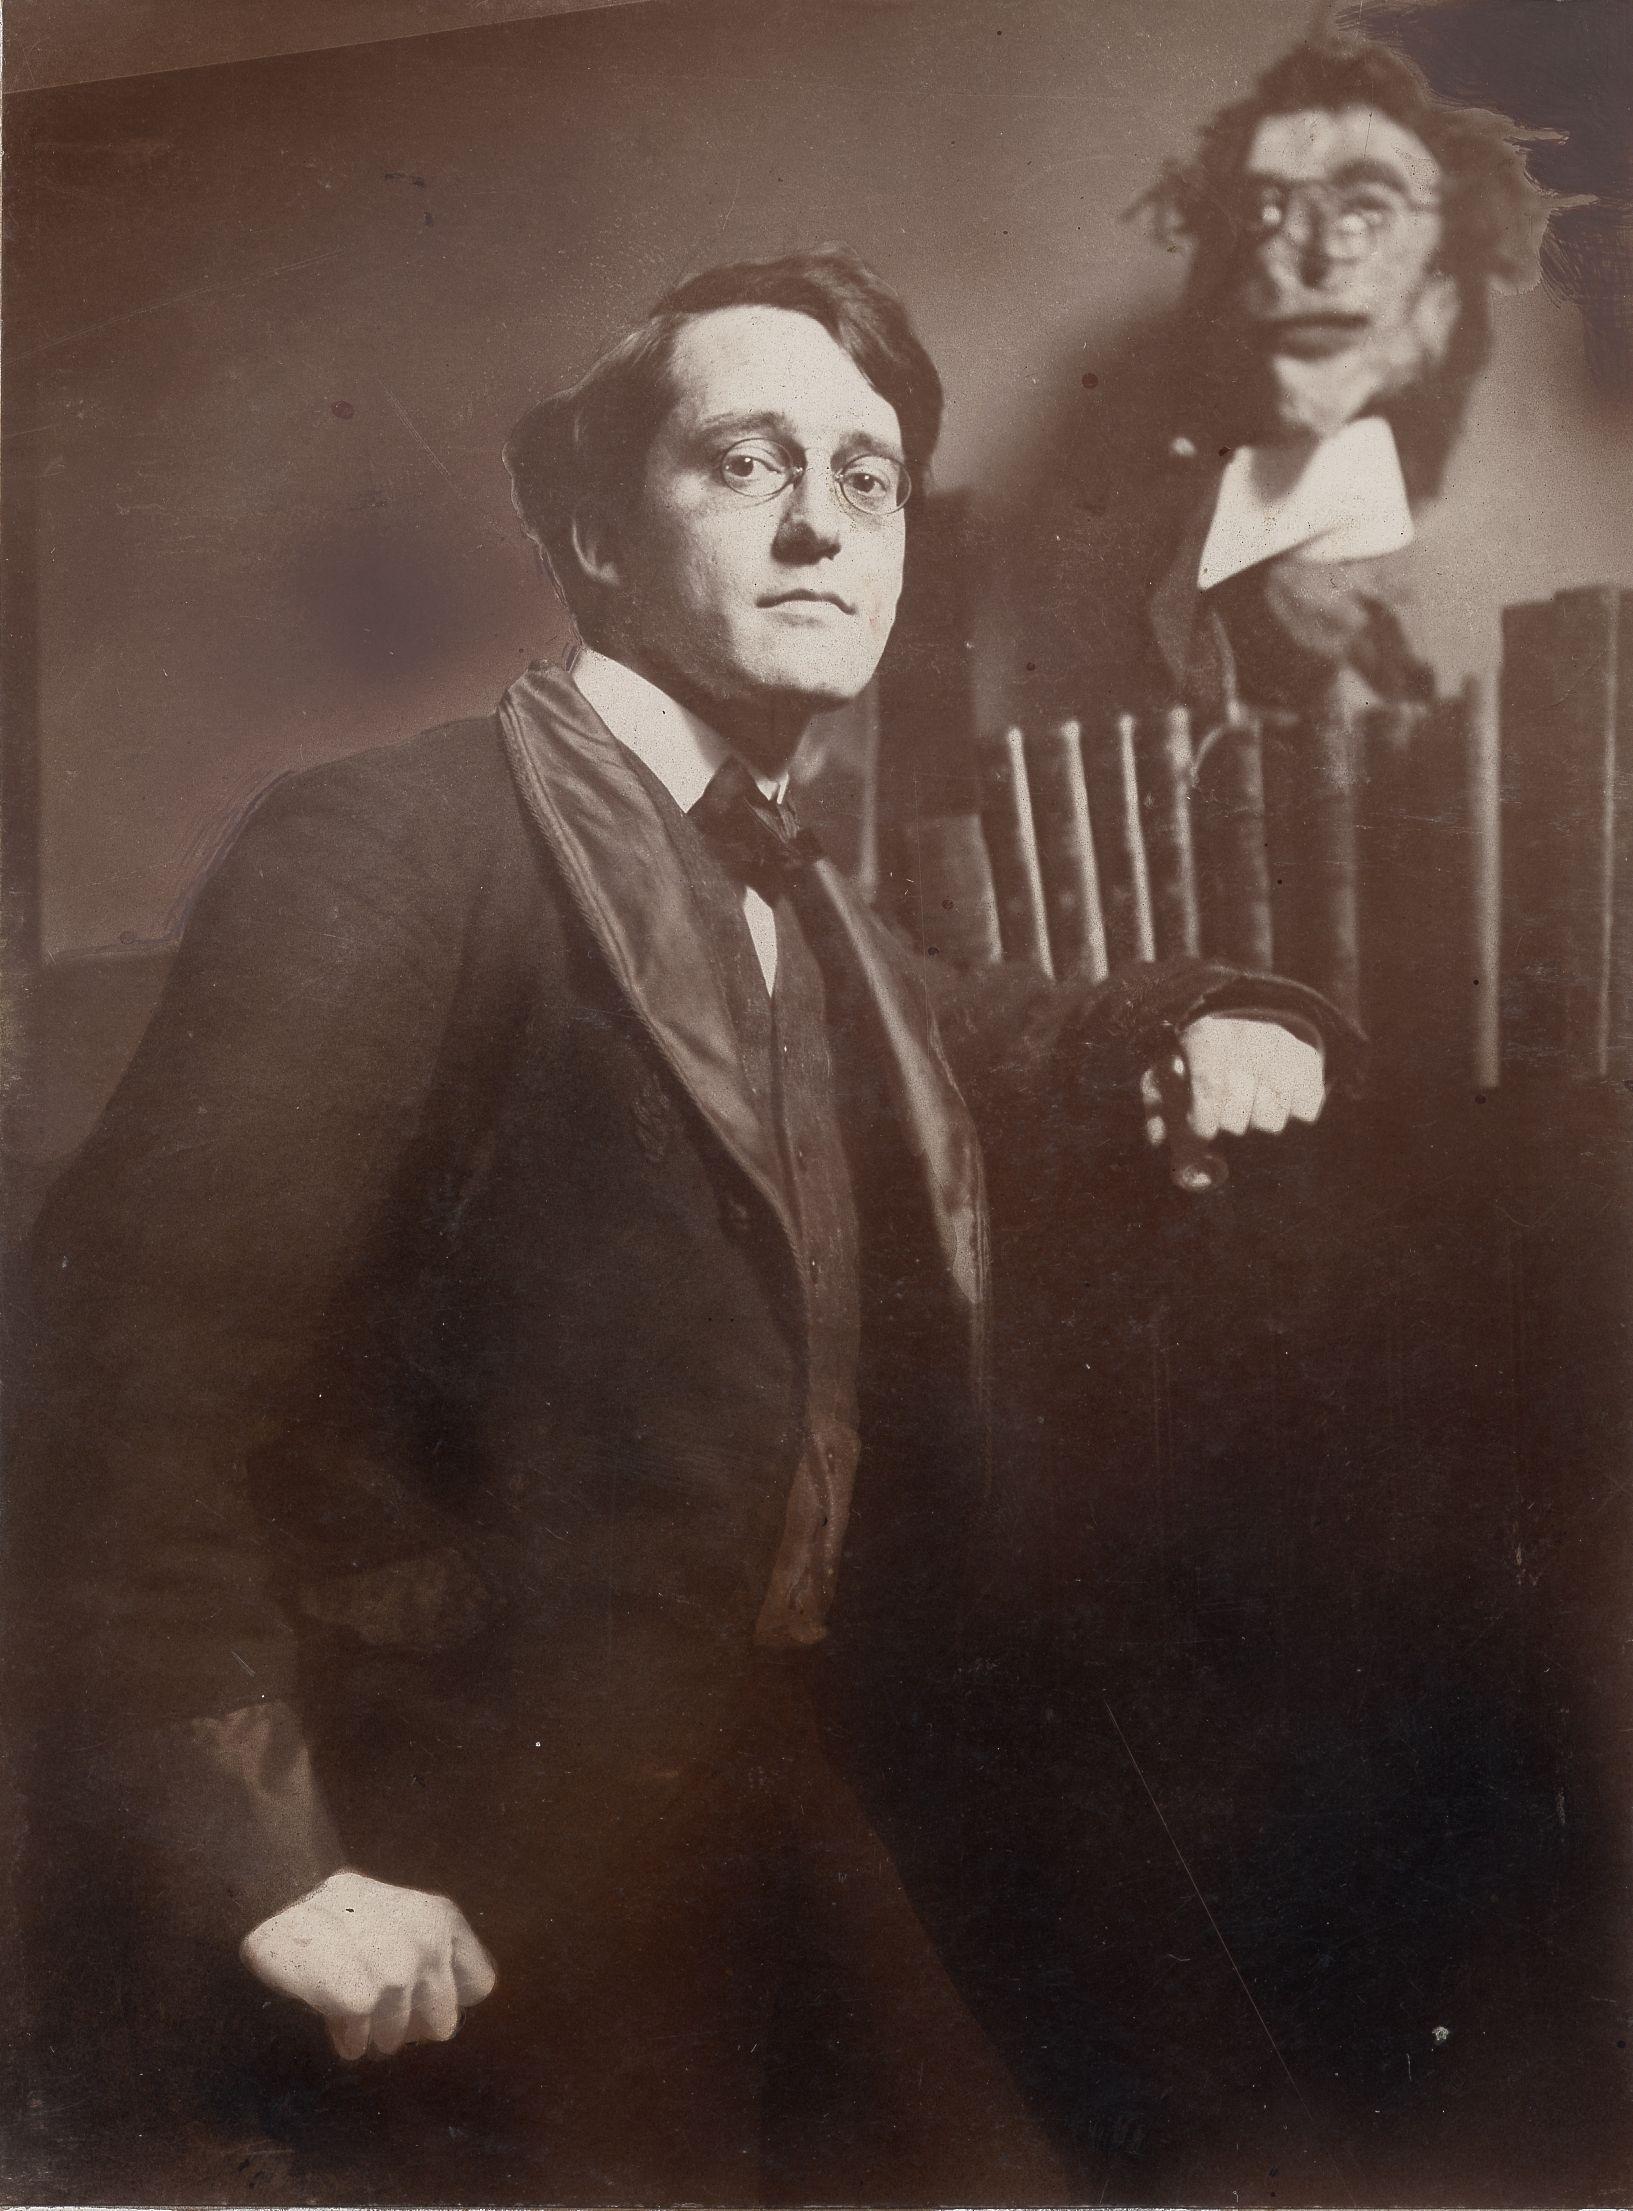 John French Sloan with Eponymous Figure? :]